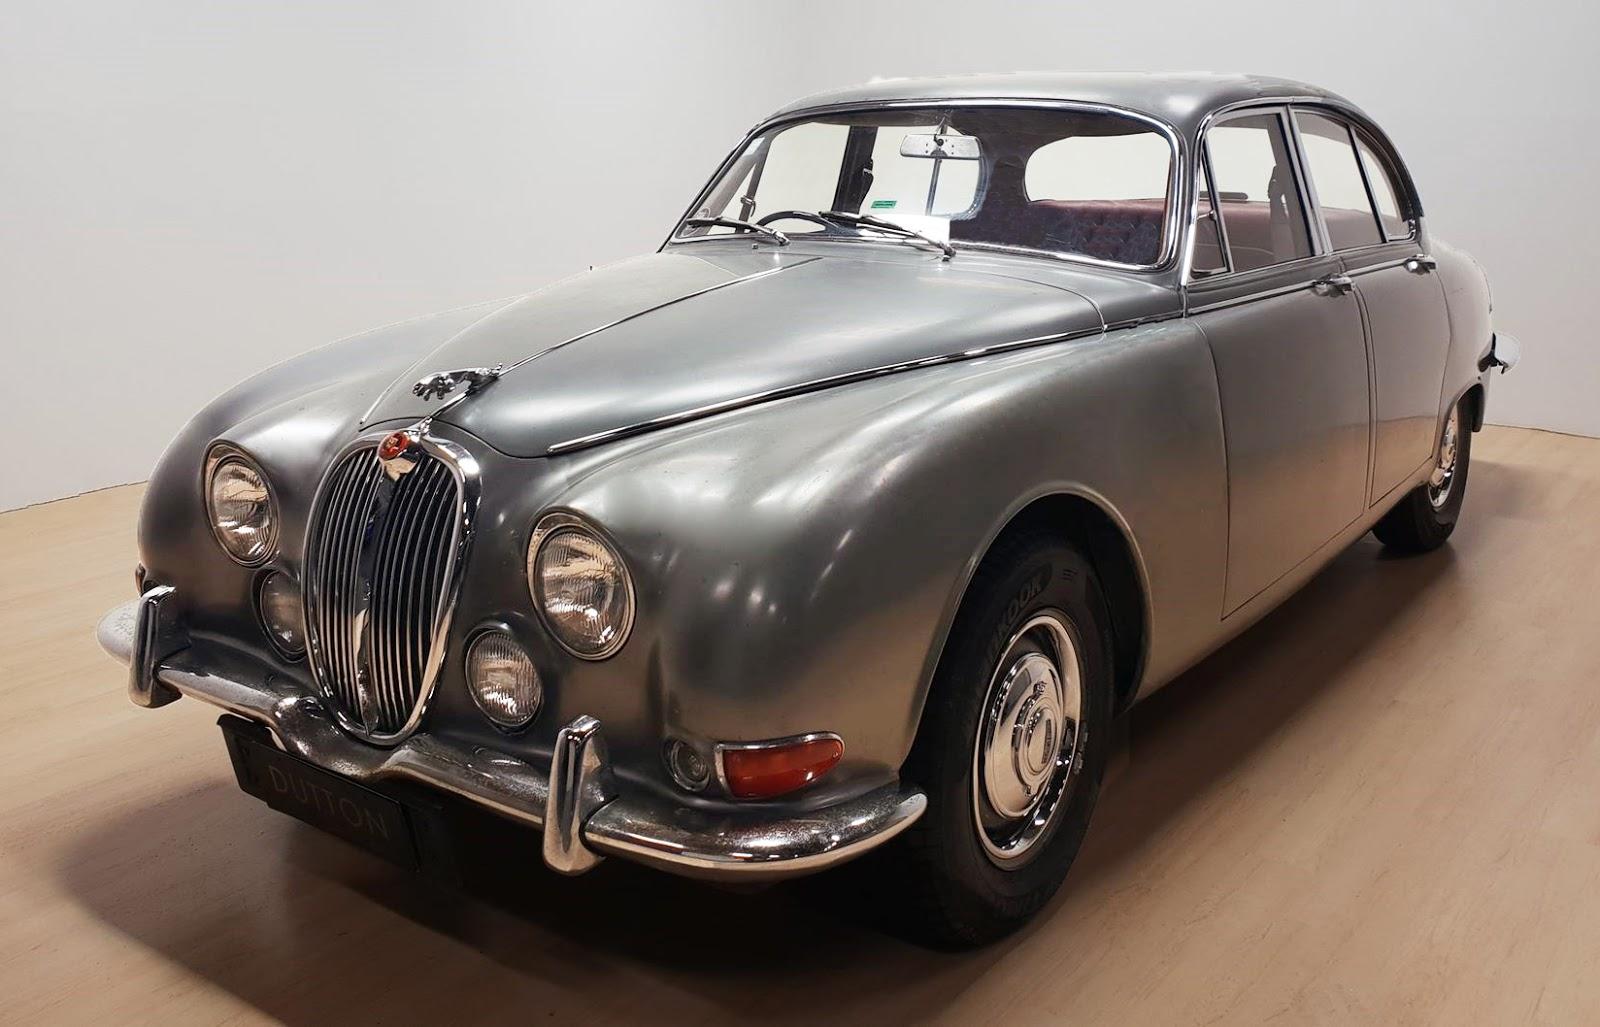 transpress nz: 1966 Jaguar S type